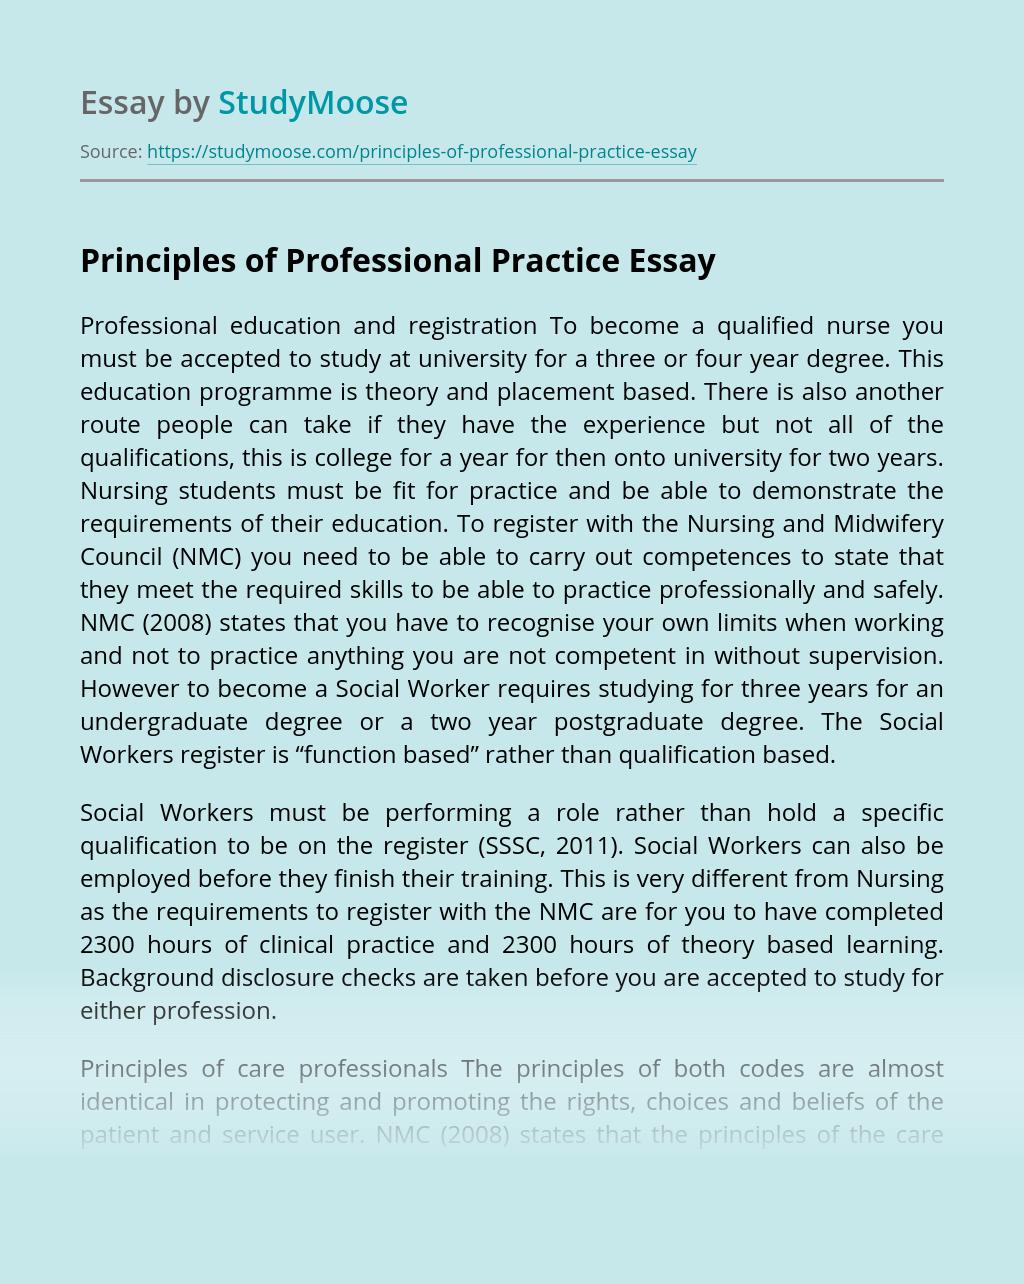 Principles of Professional Practice